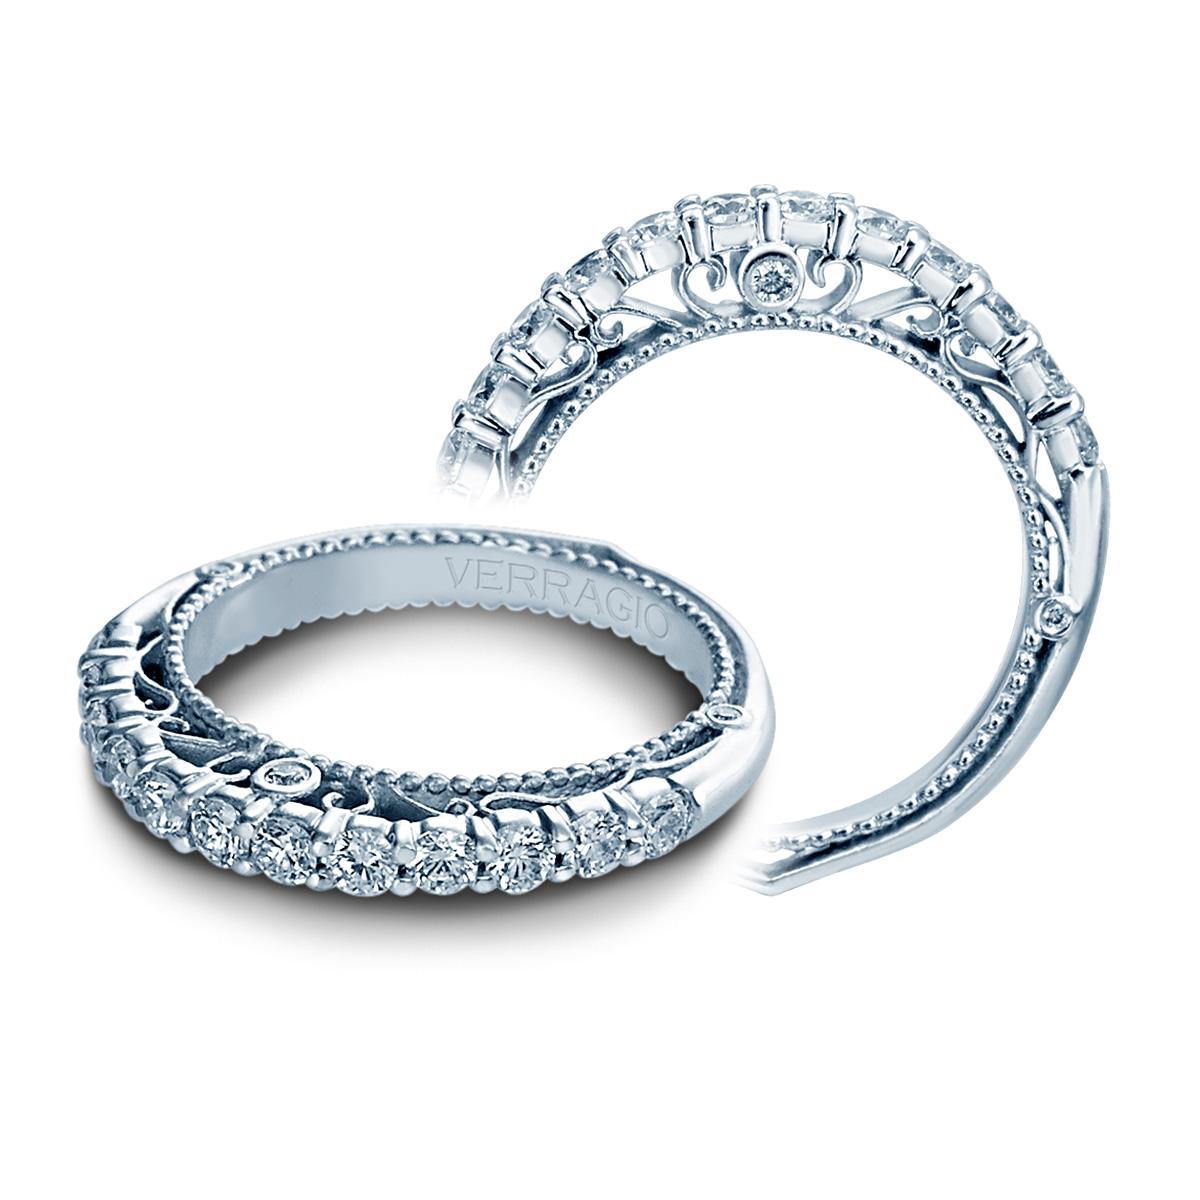 14 Karat Bands: Verragio Venetian-5010W 14 Karat Wedding Ring / Band